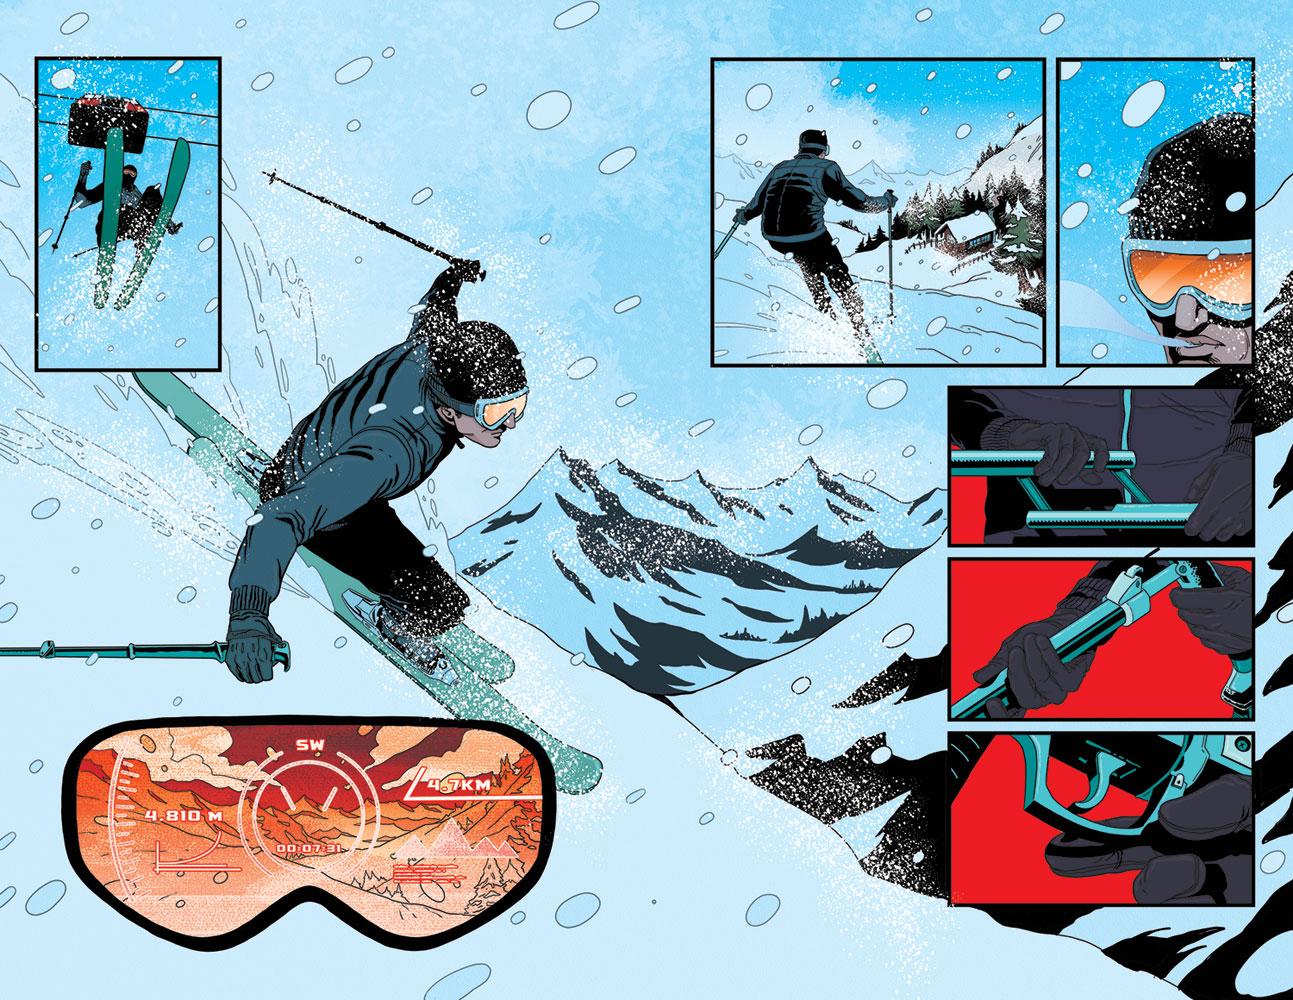 James Bond Vol. 02 #1 (Lobosco Artboard incentive cover - 01061) (10-copy)  [2017] - Dynamite